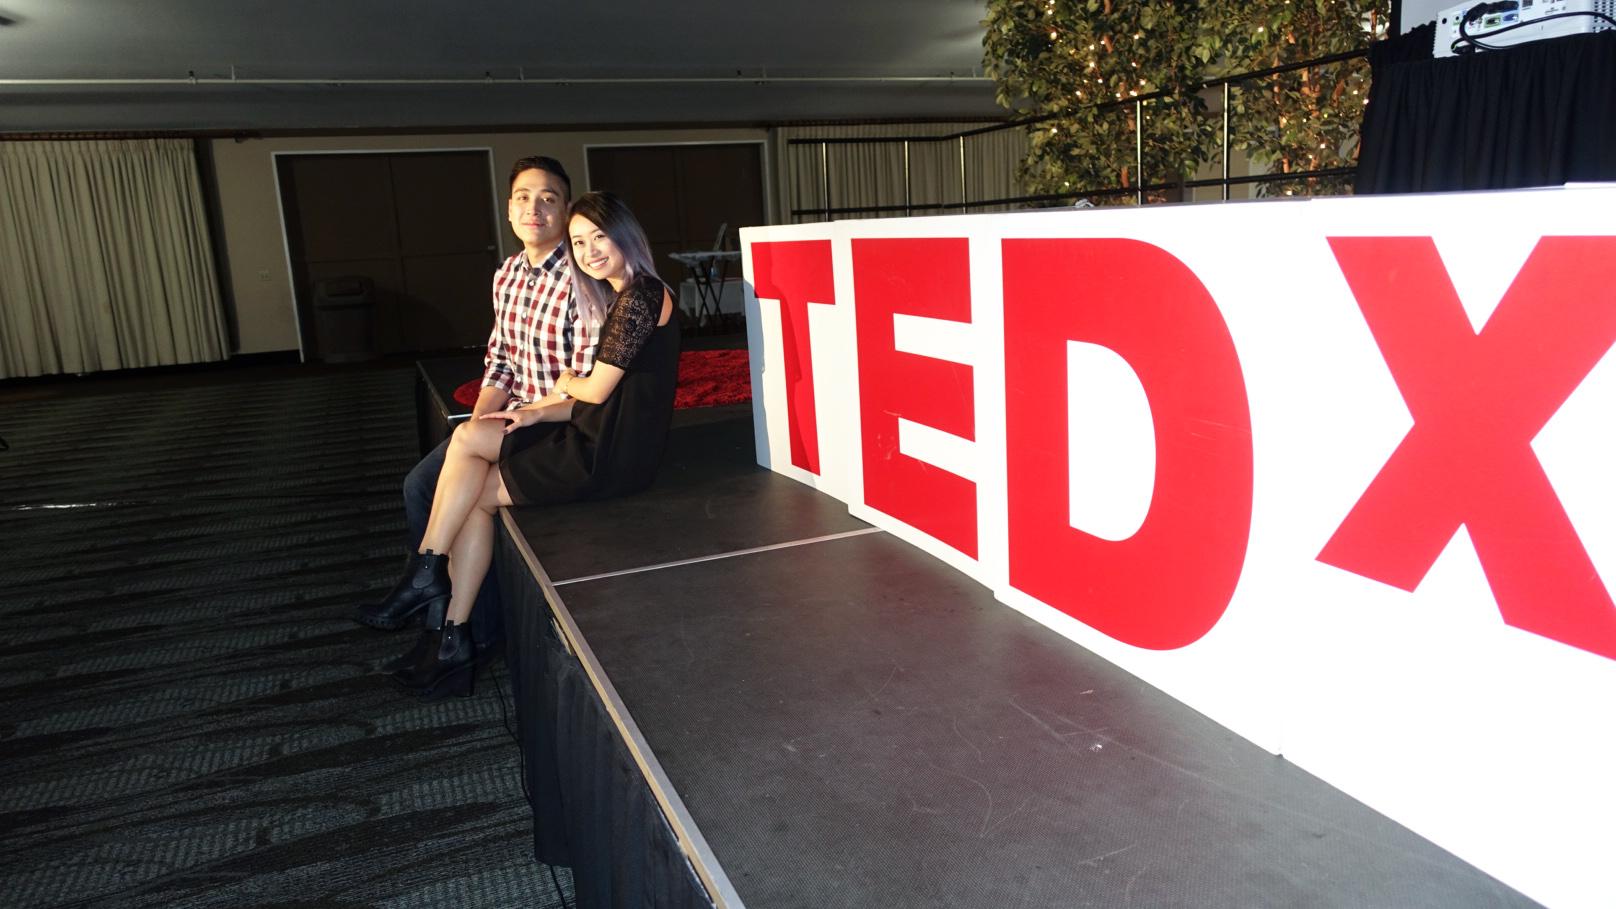 TED Aileen Wilson